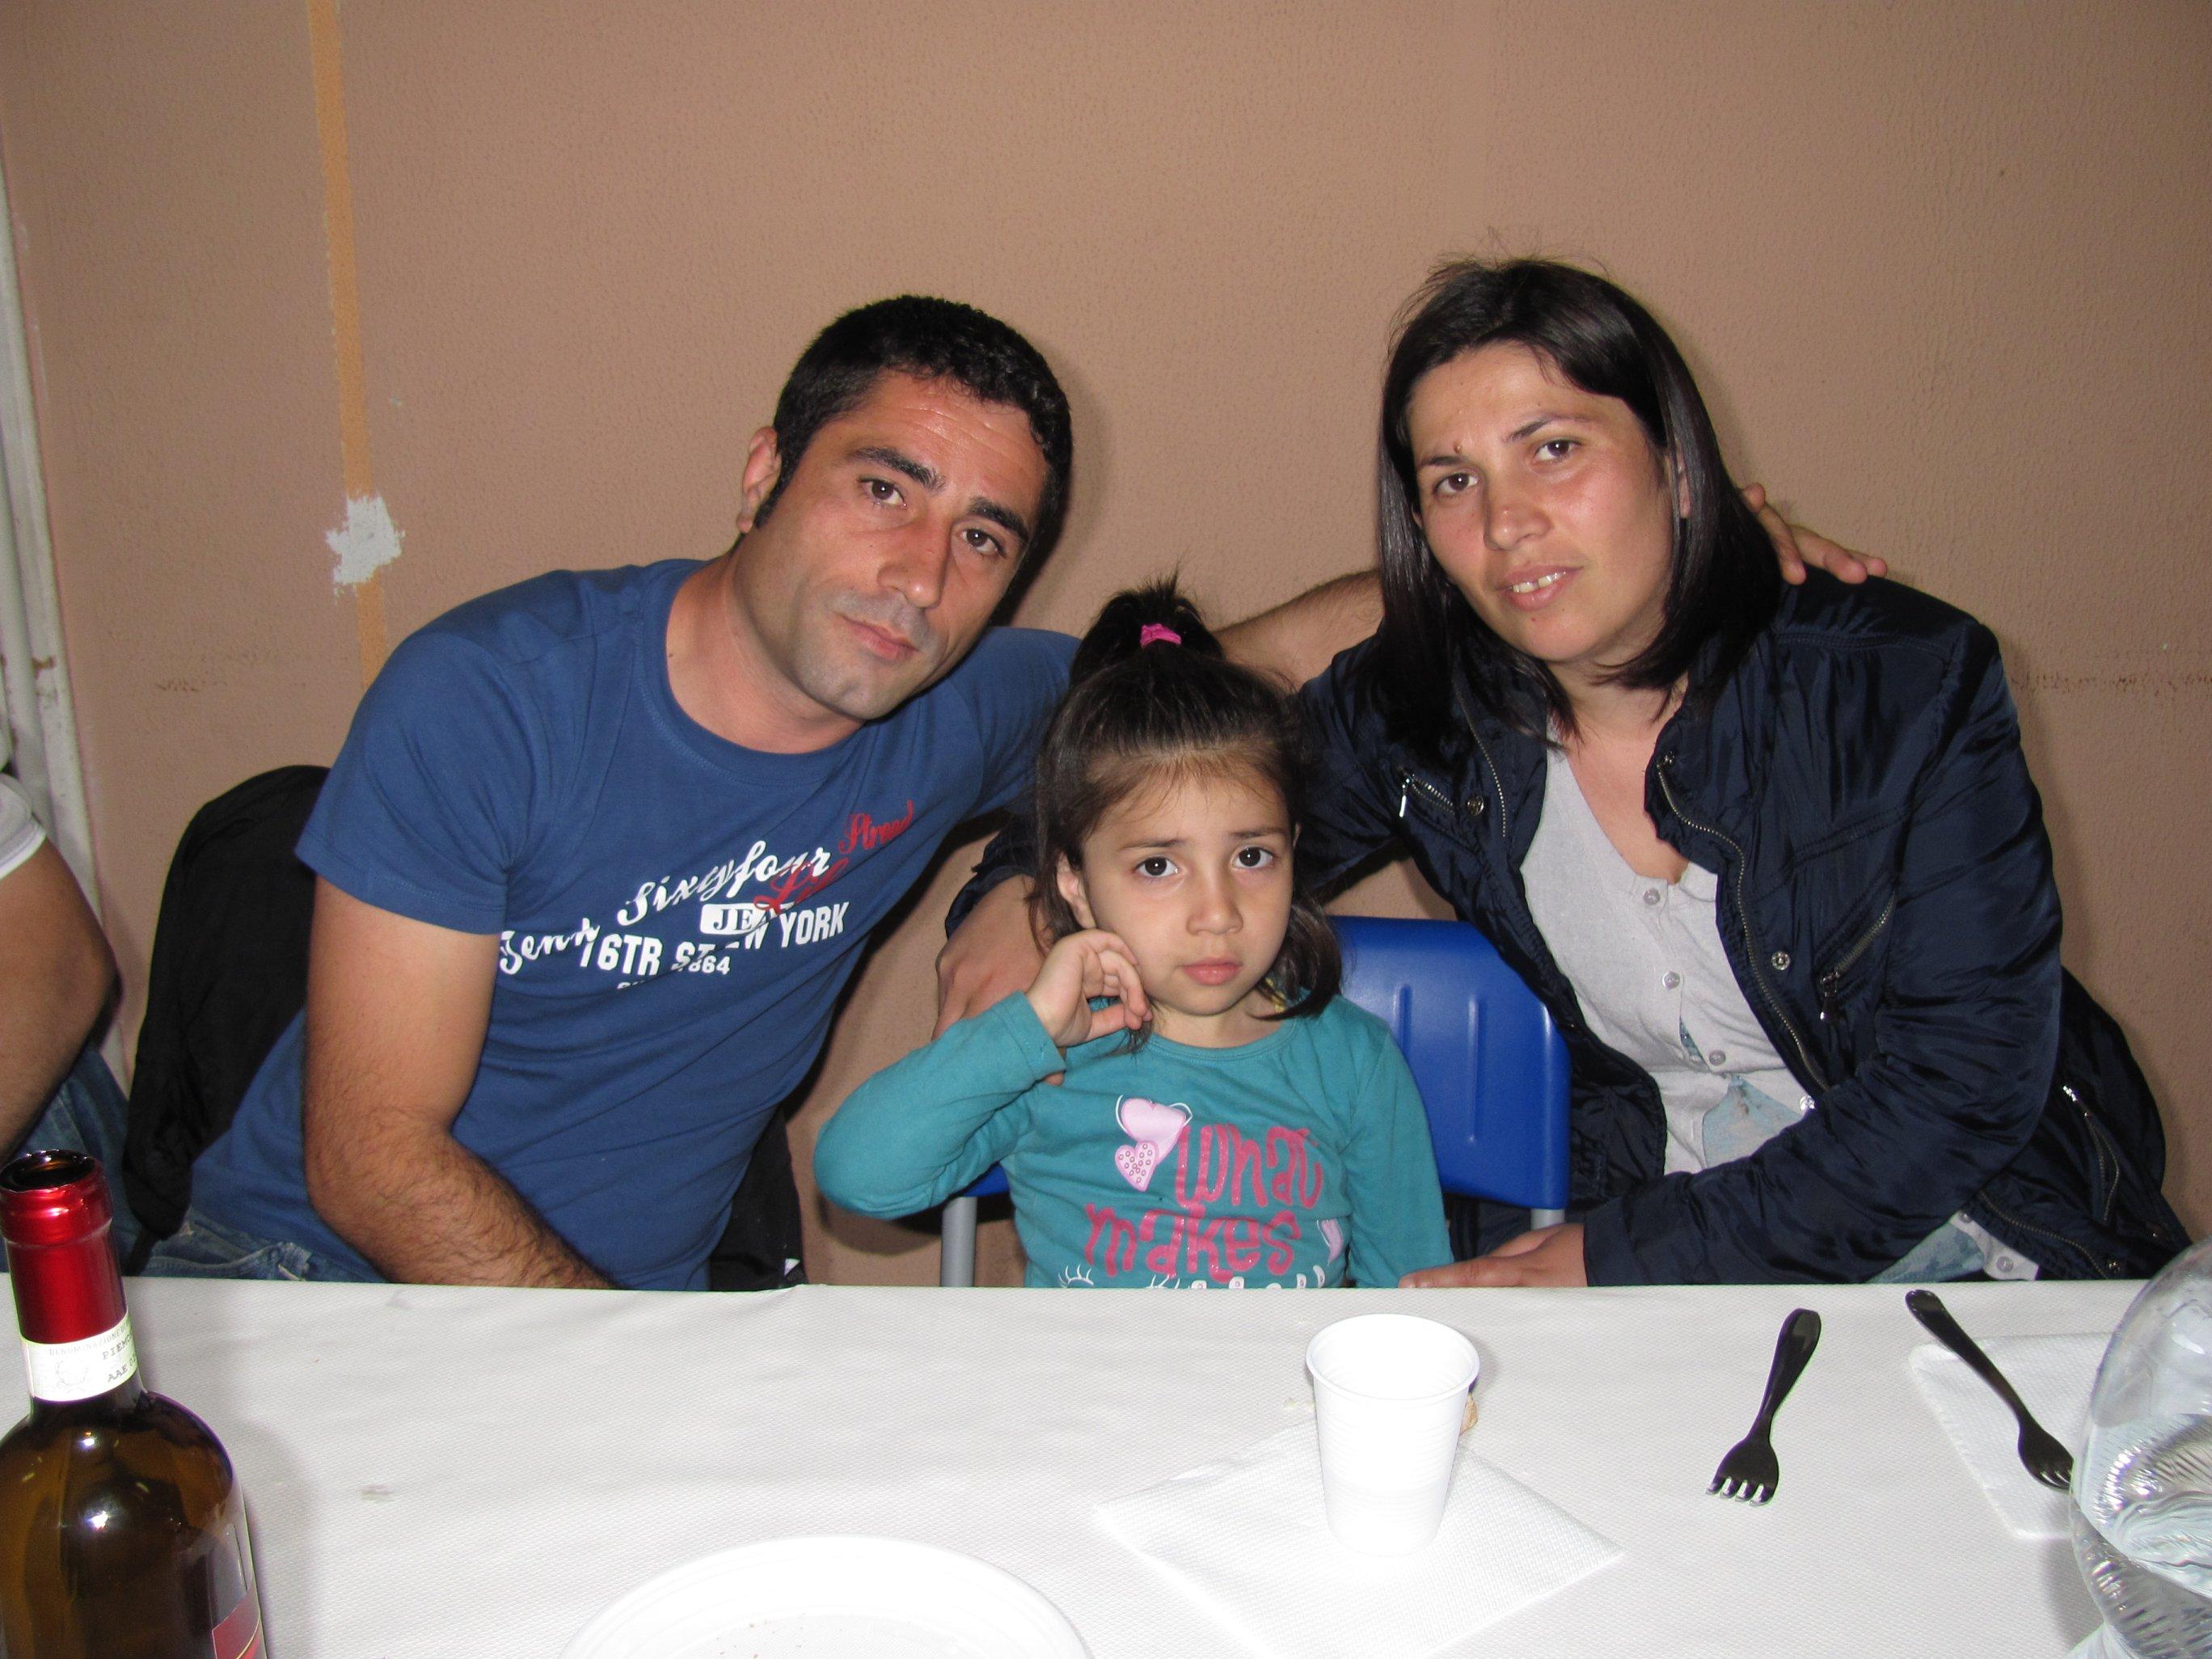 festa_madonna_2012-05-27-21-46-00